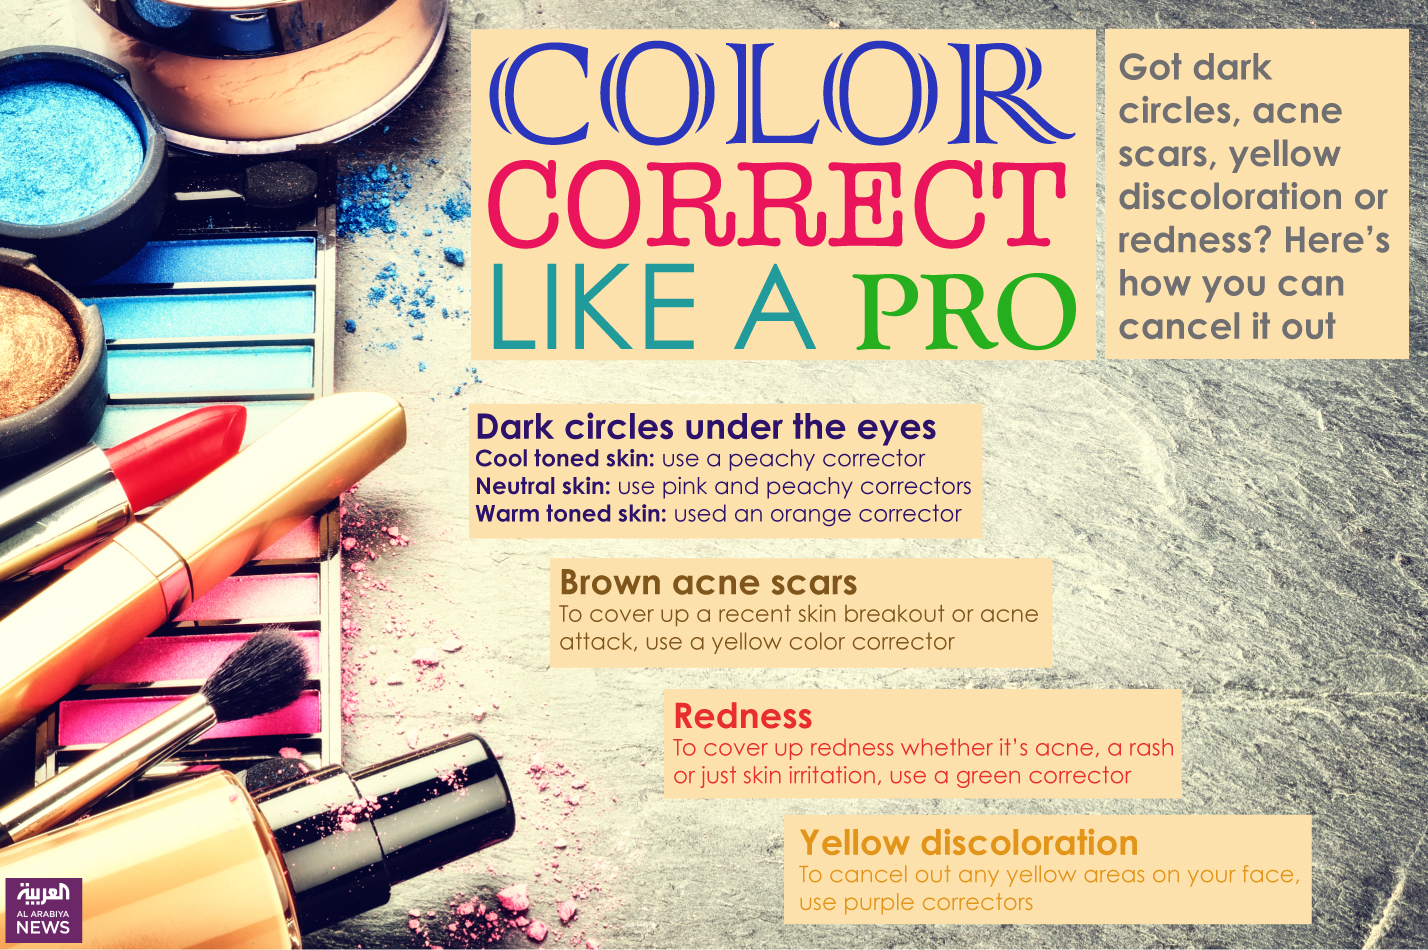 Color Corrector like A Pro